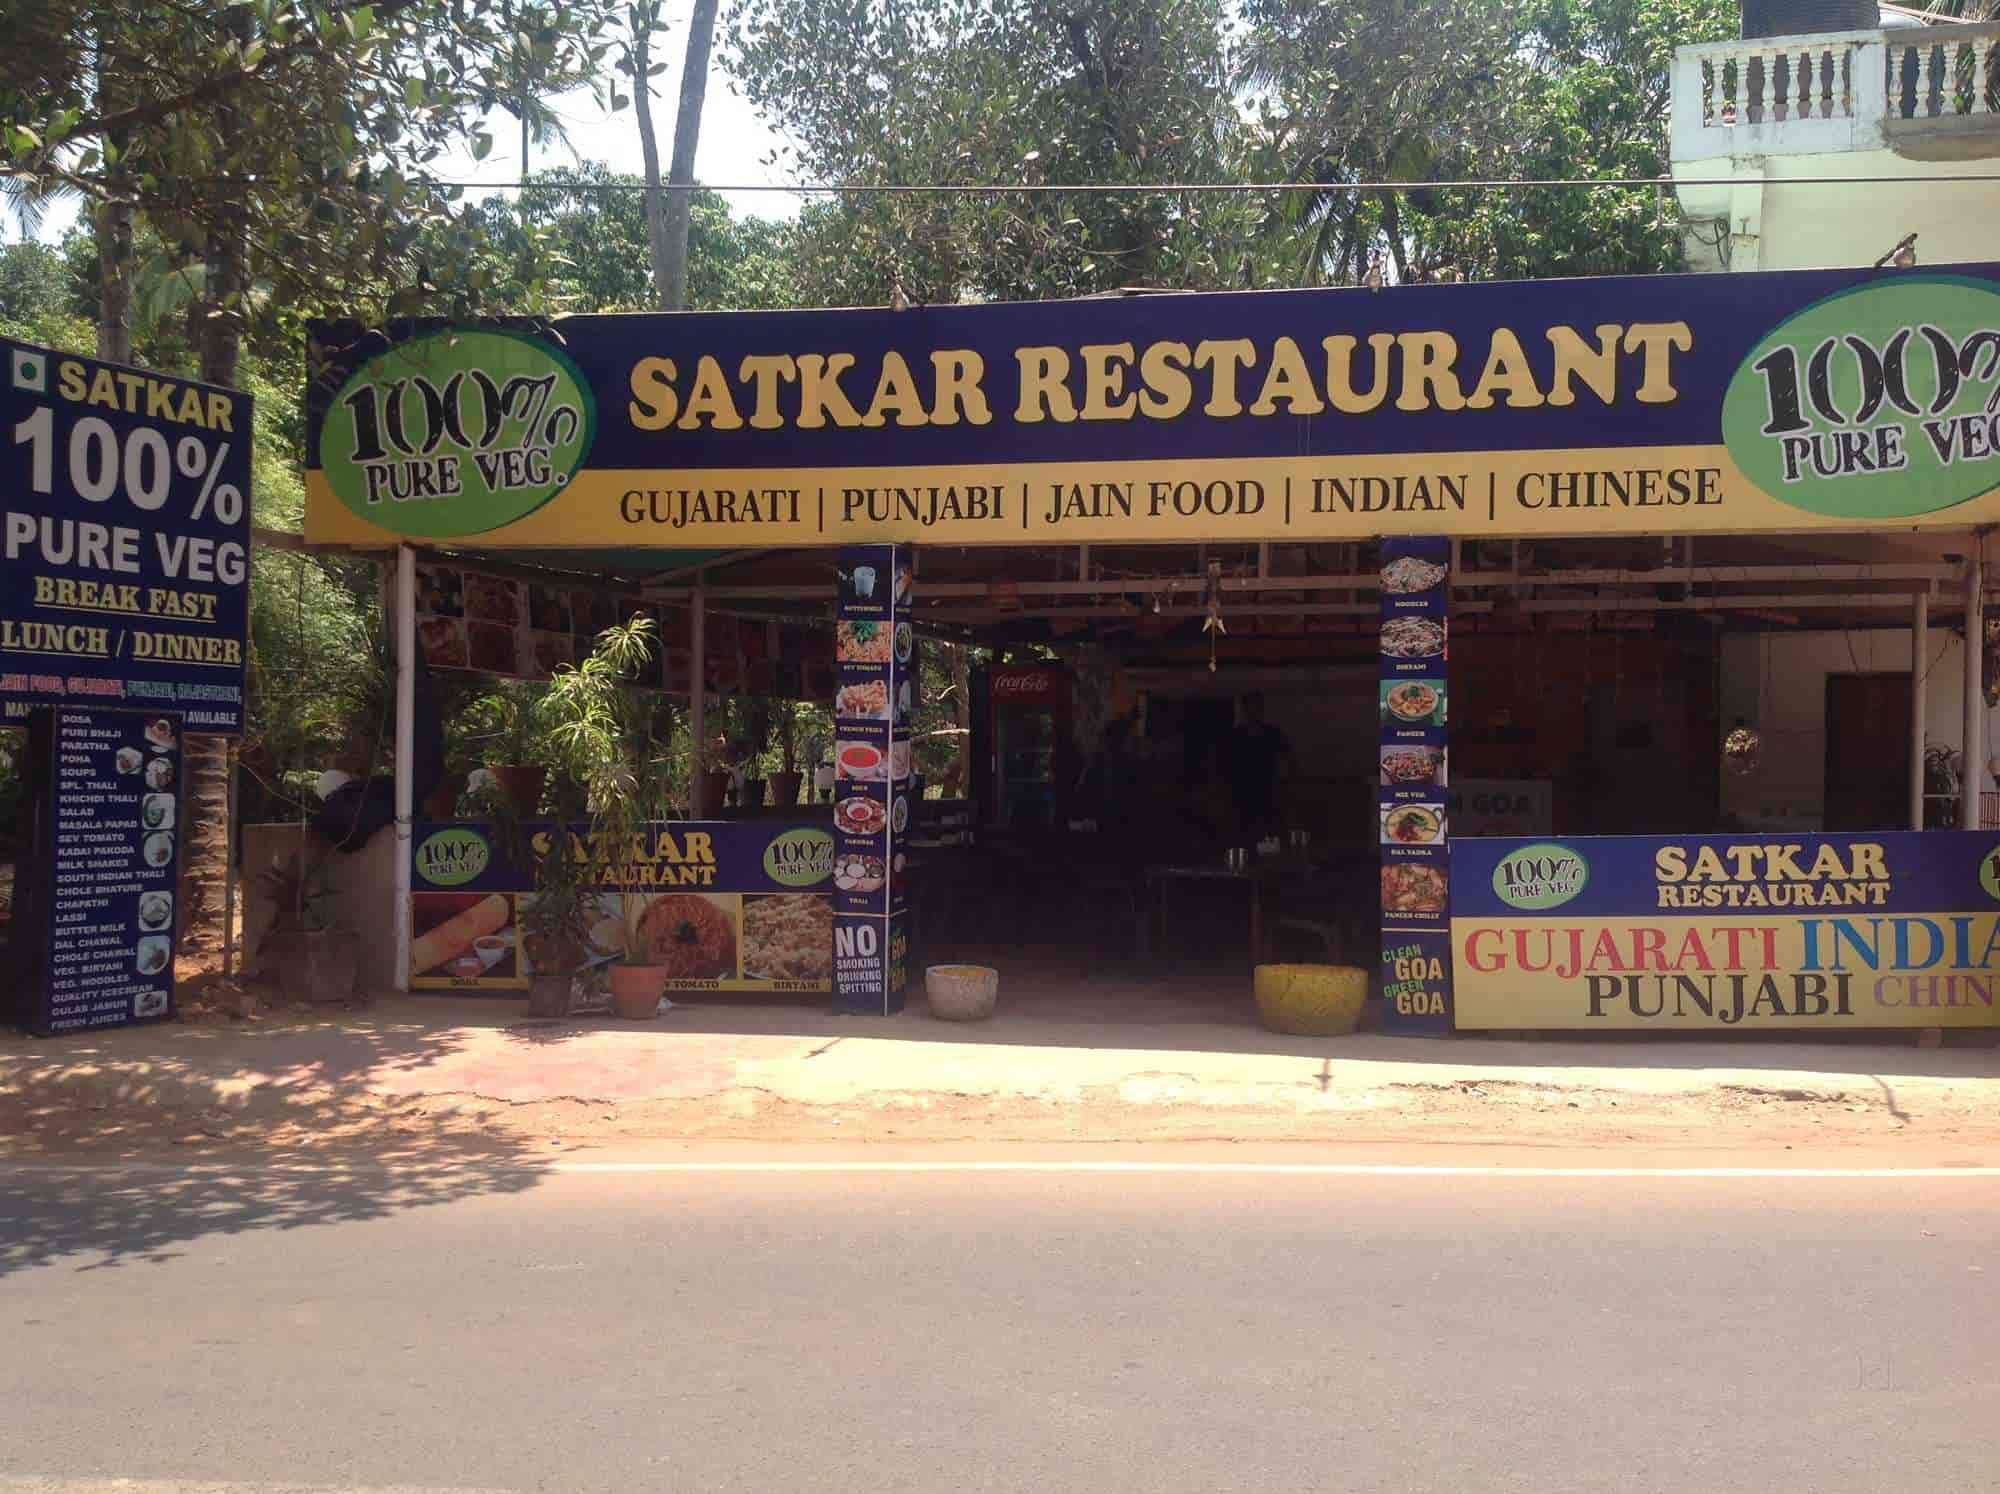 Satkar Pure Veg Restaurant Calangute Goa Restaurants Justdial